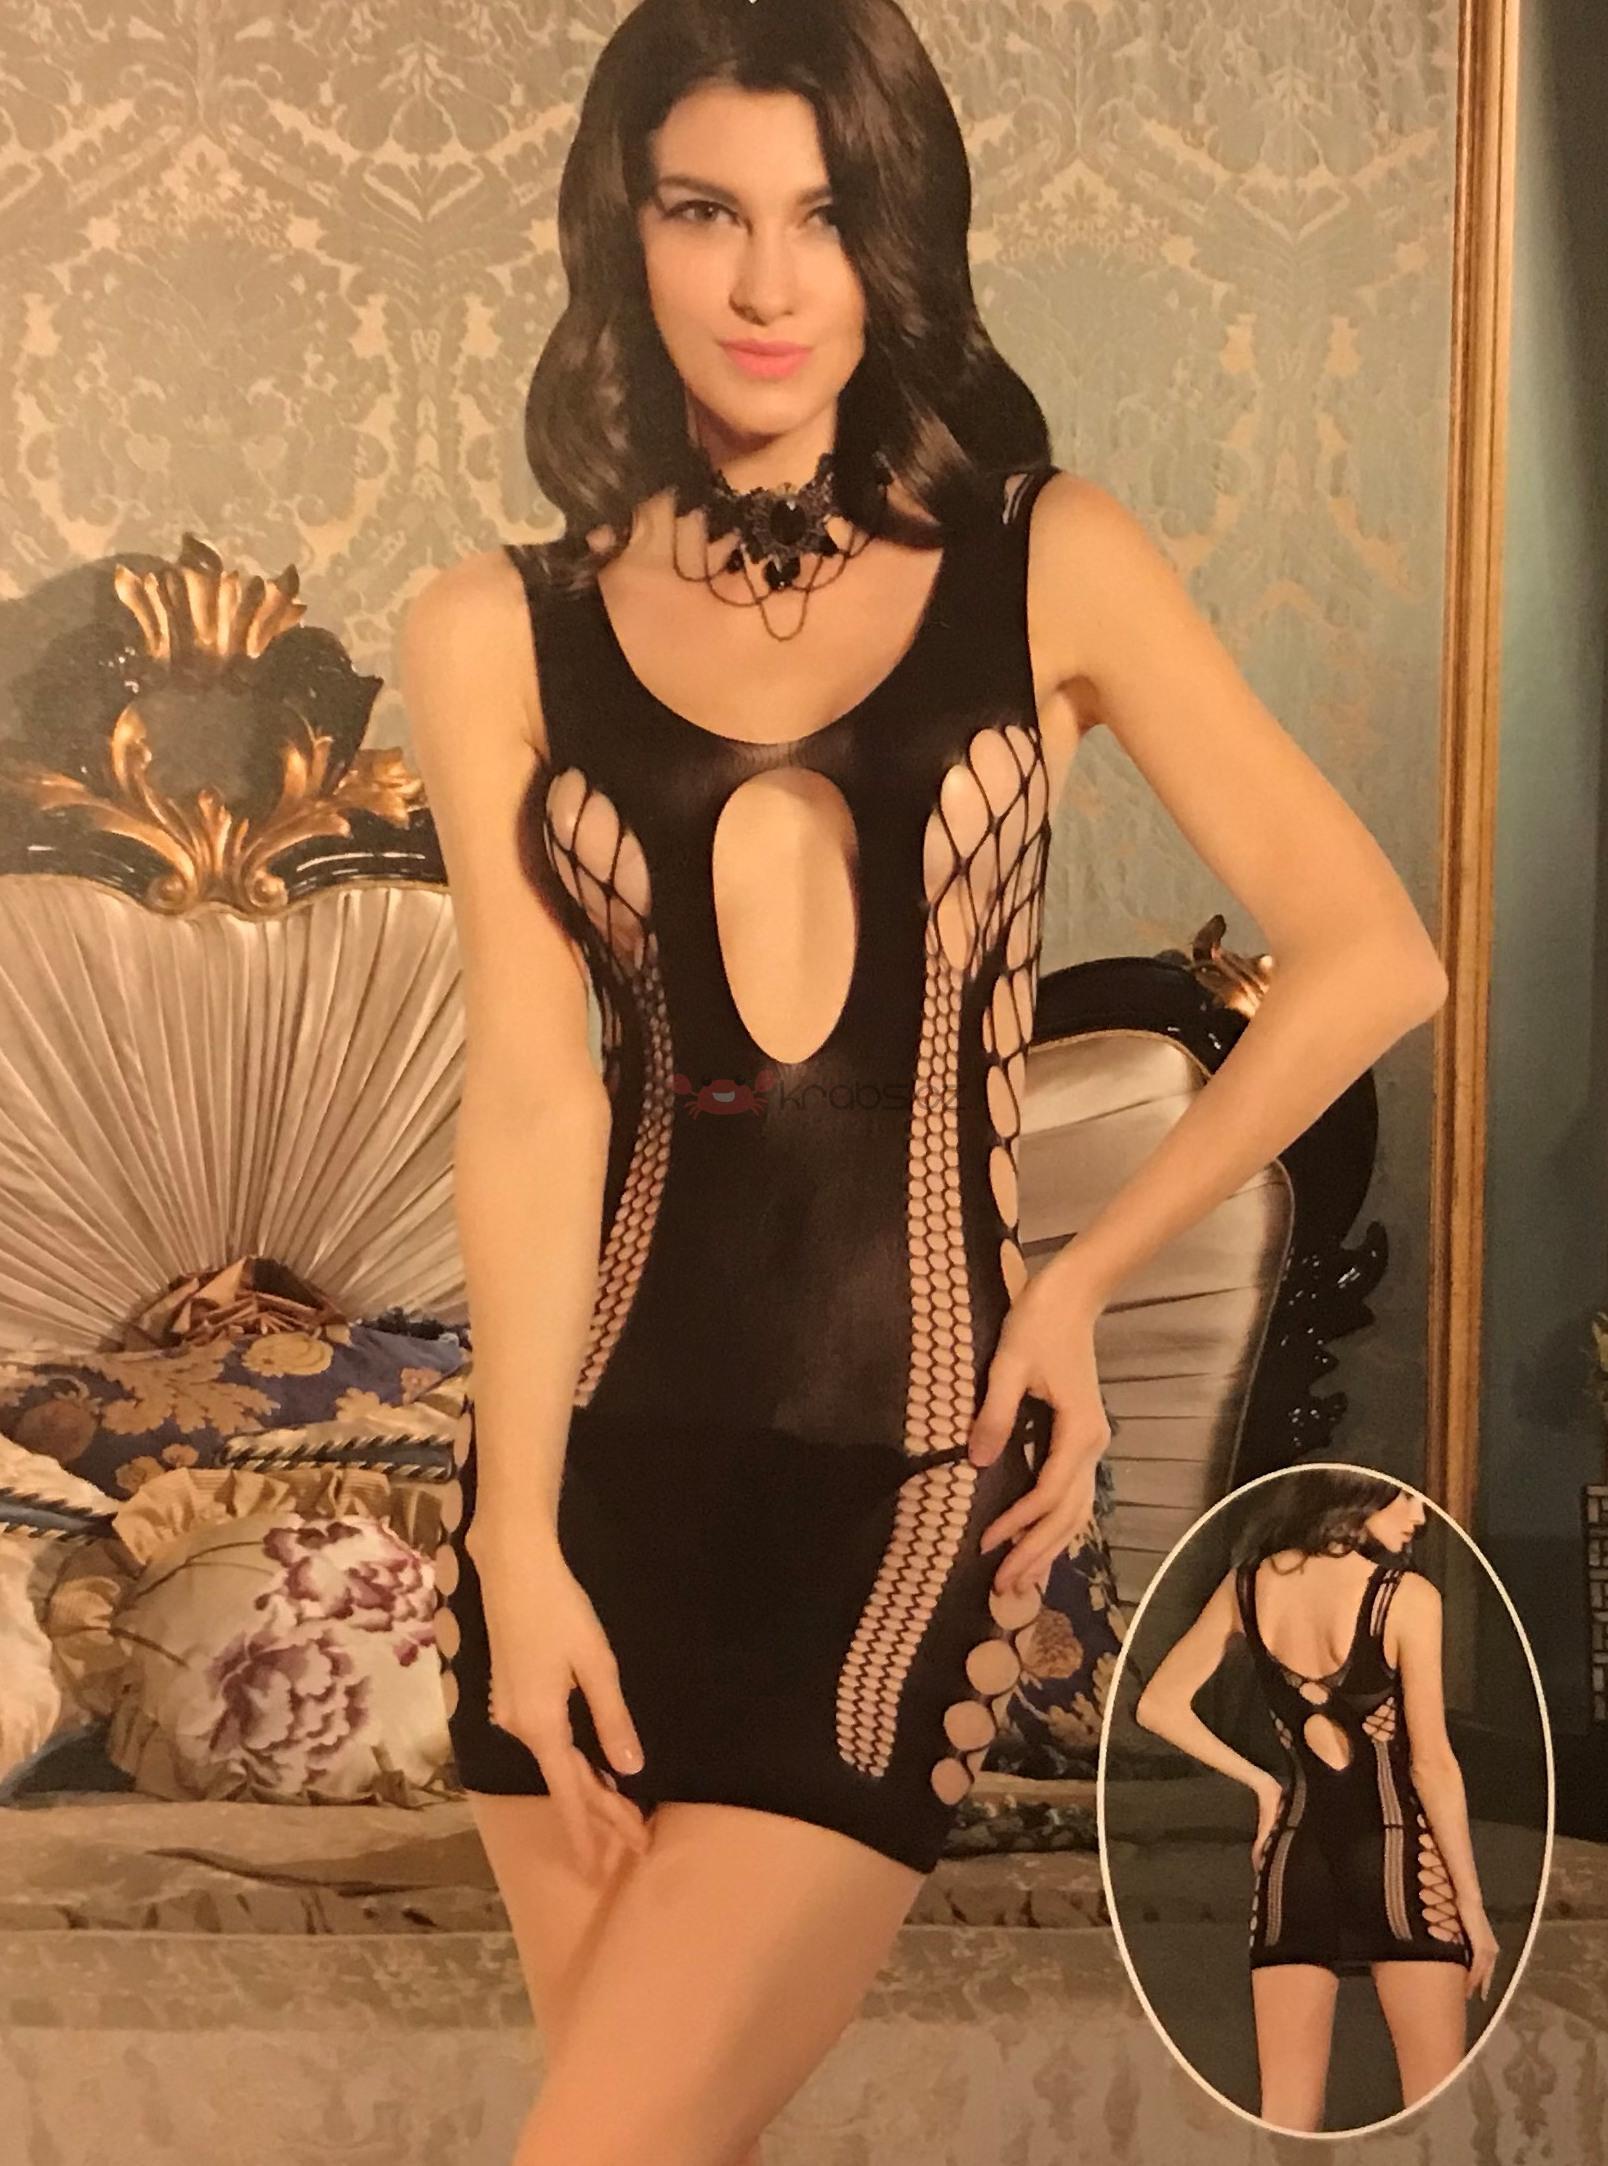 Jessica Drake - Model page